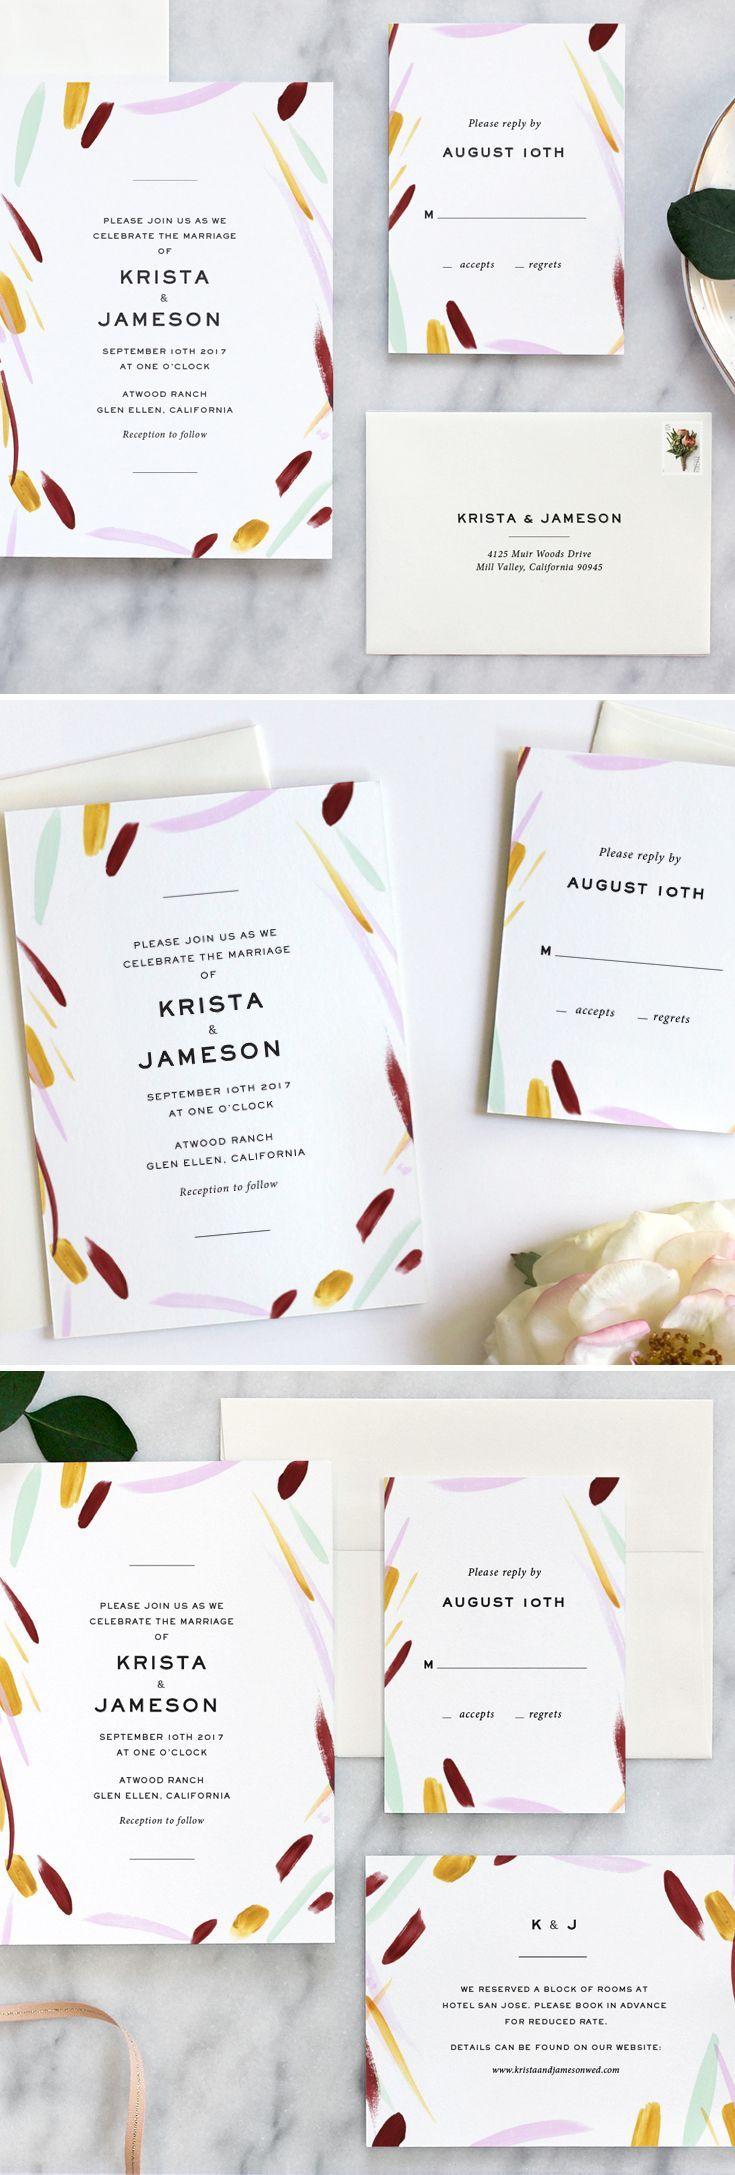 3795 Best Invitations Images On Pinterest Invitations Bridal